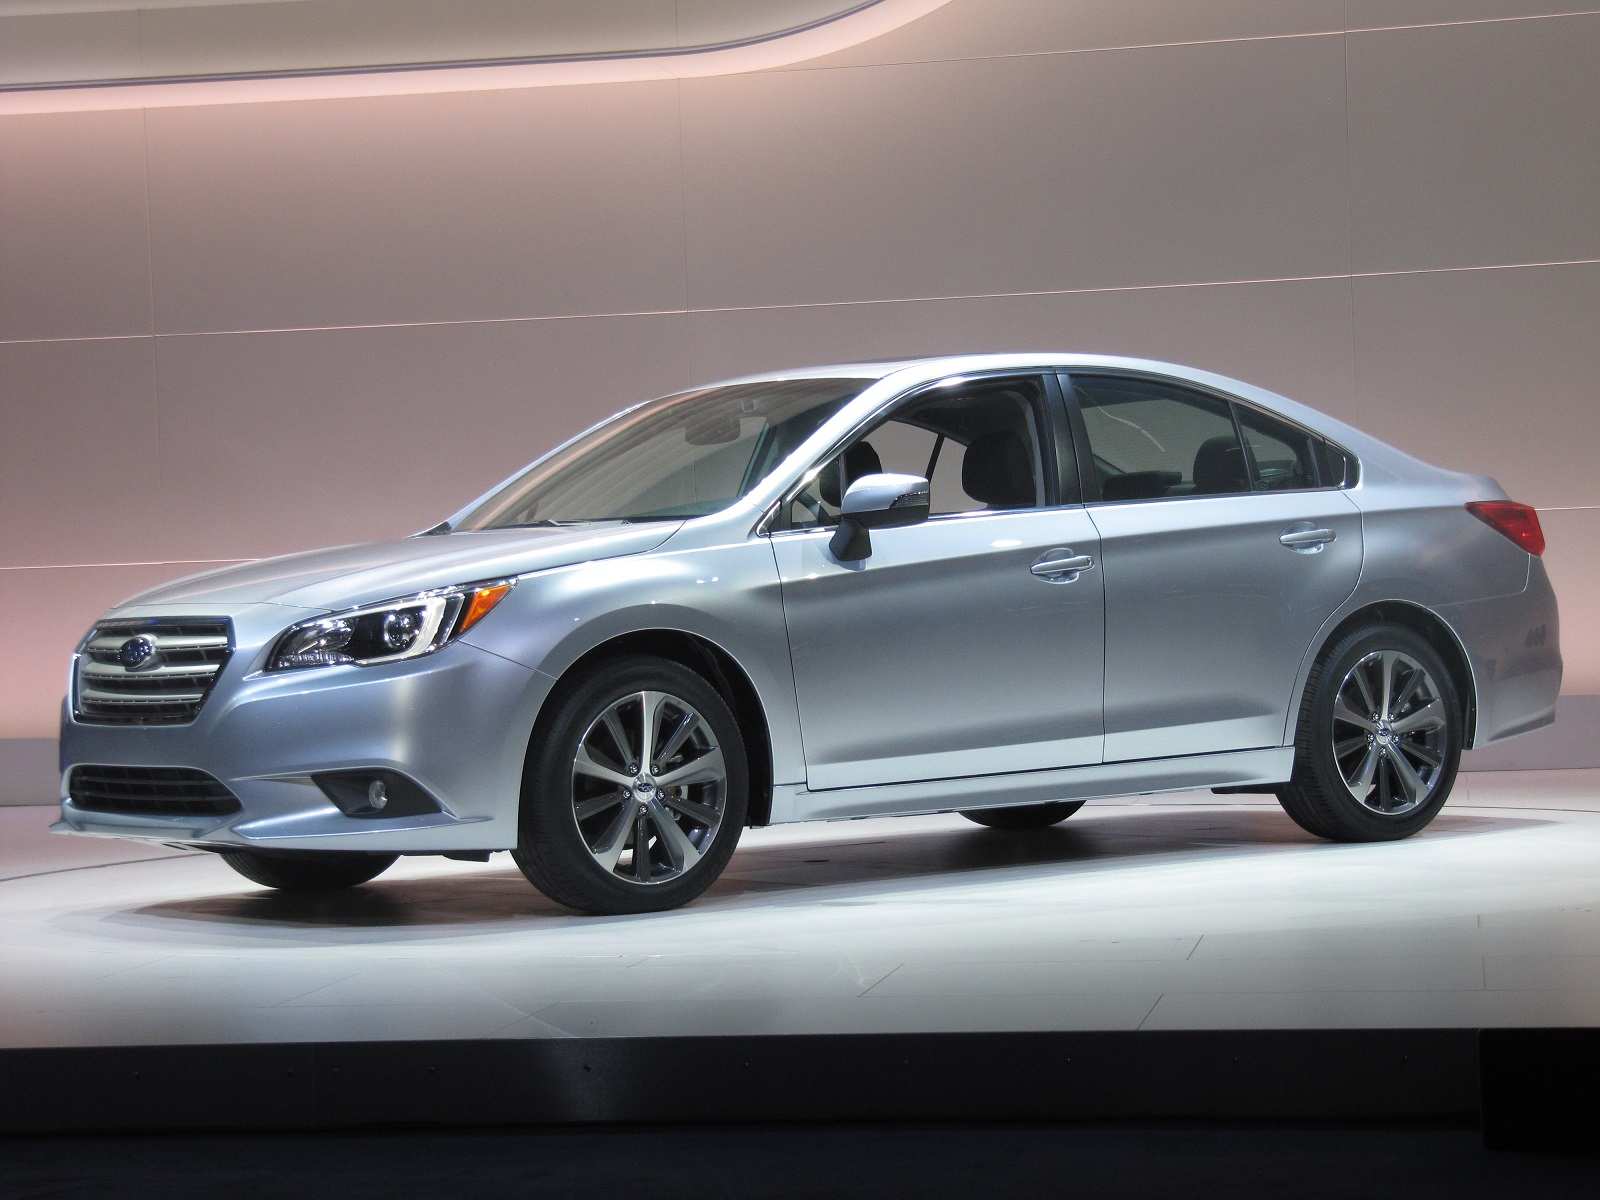 2015 Subaru Legacy Priced From $22,490